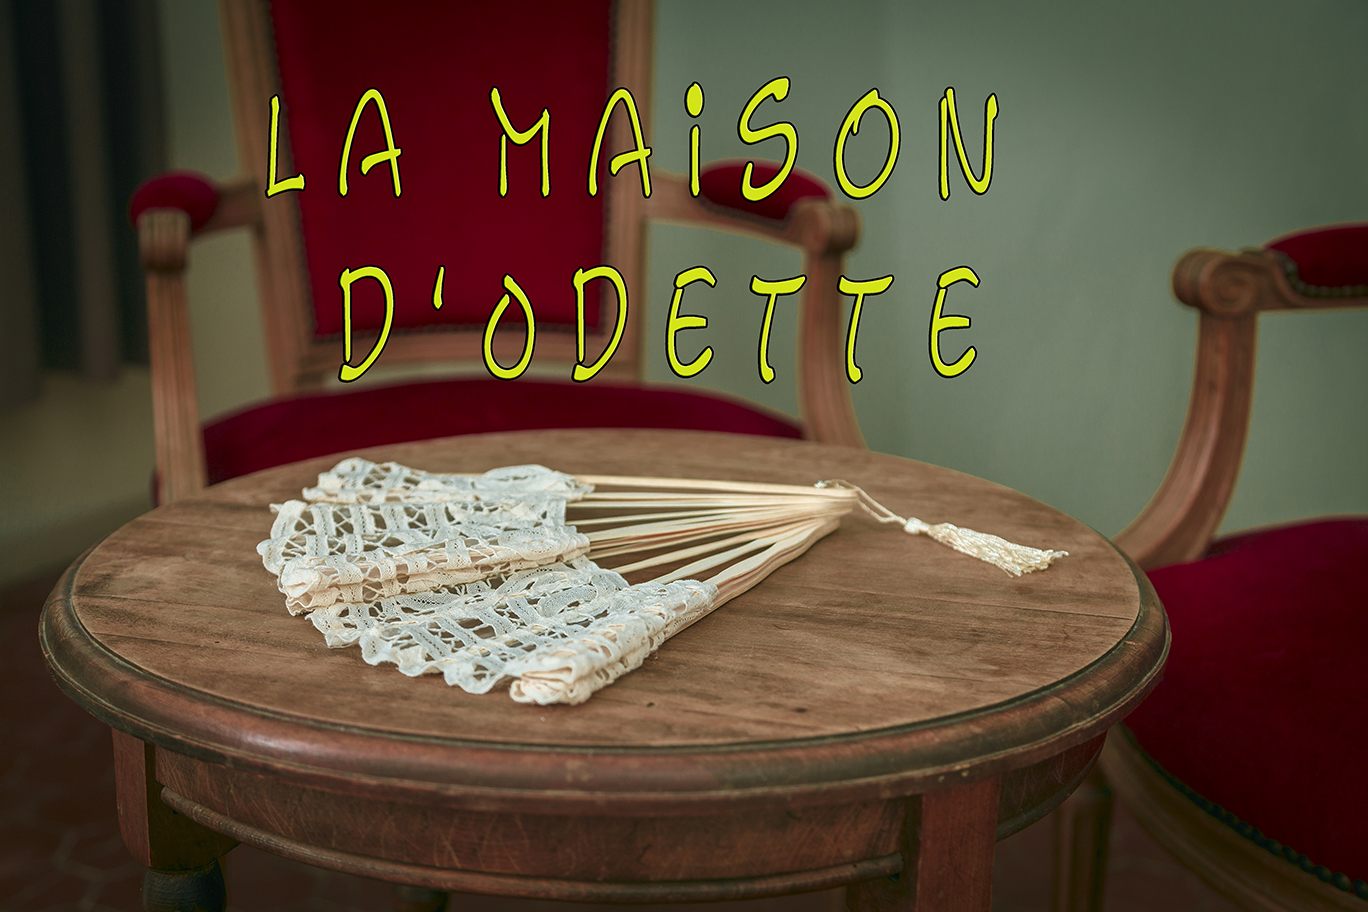 France; Frankreich; la citoat; la maison dodette; provence; southern france; südfrankreich; where to stay in la ciotat; la maison d'odette